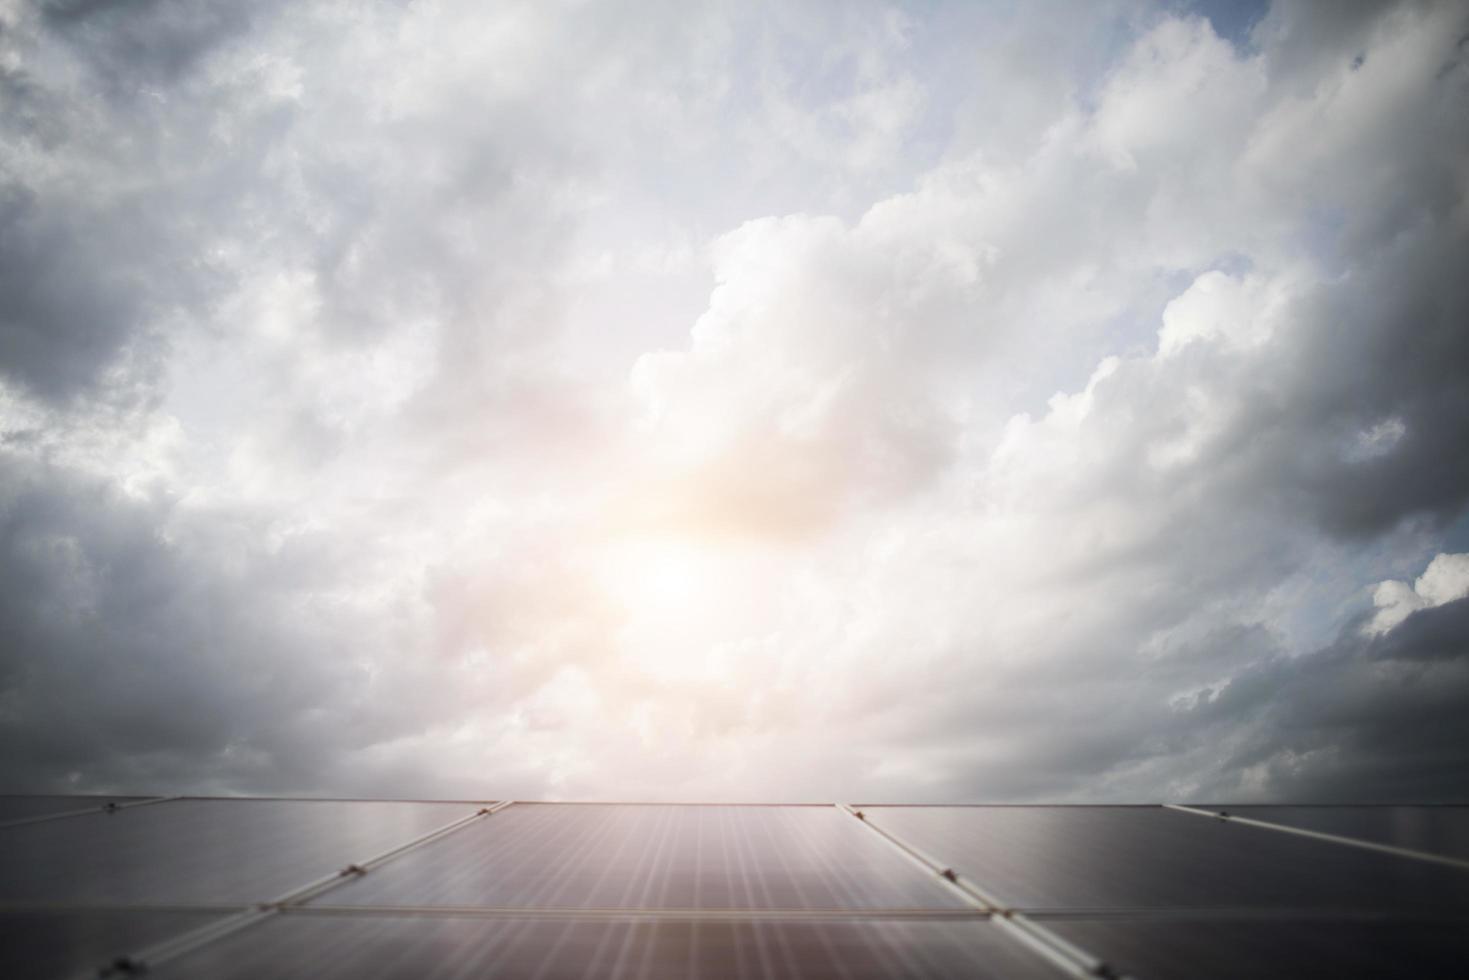 solcell i ljus solbakgrund foto